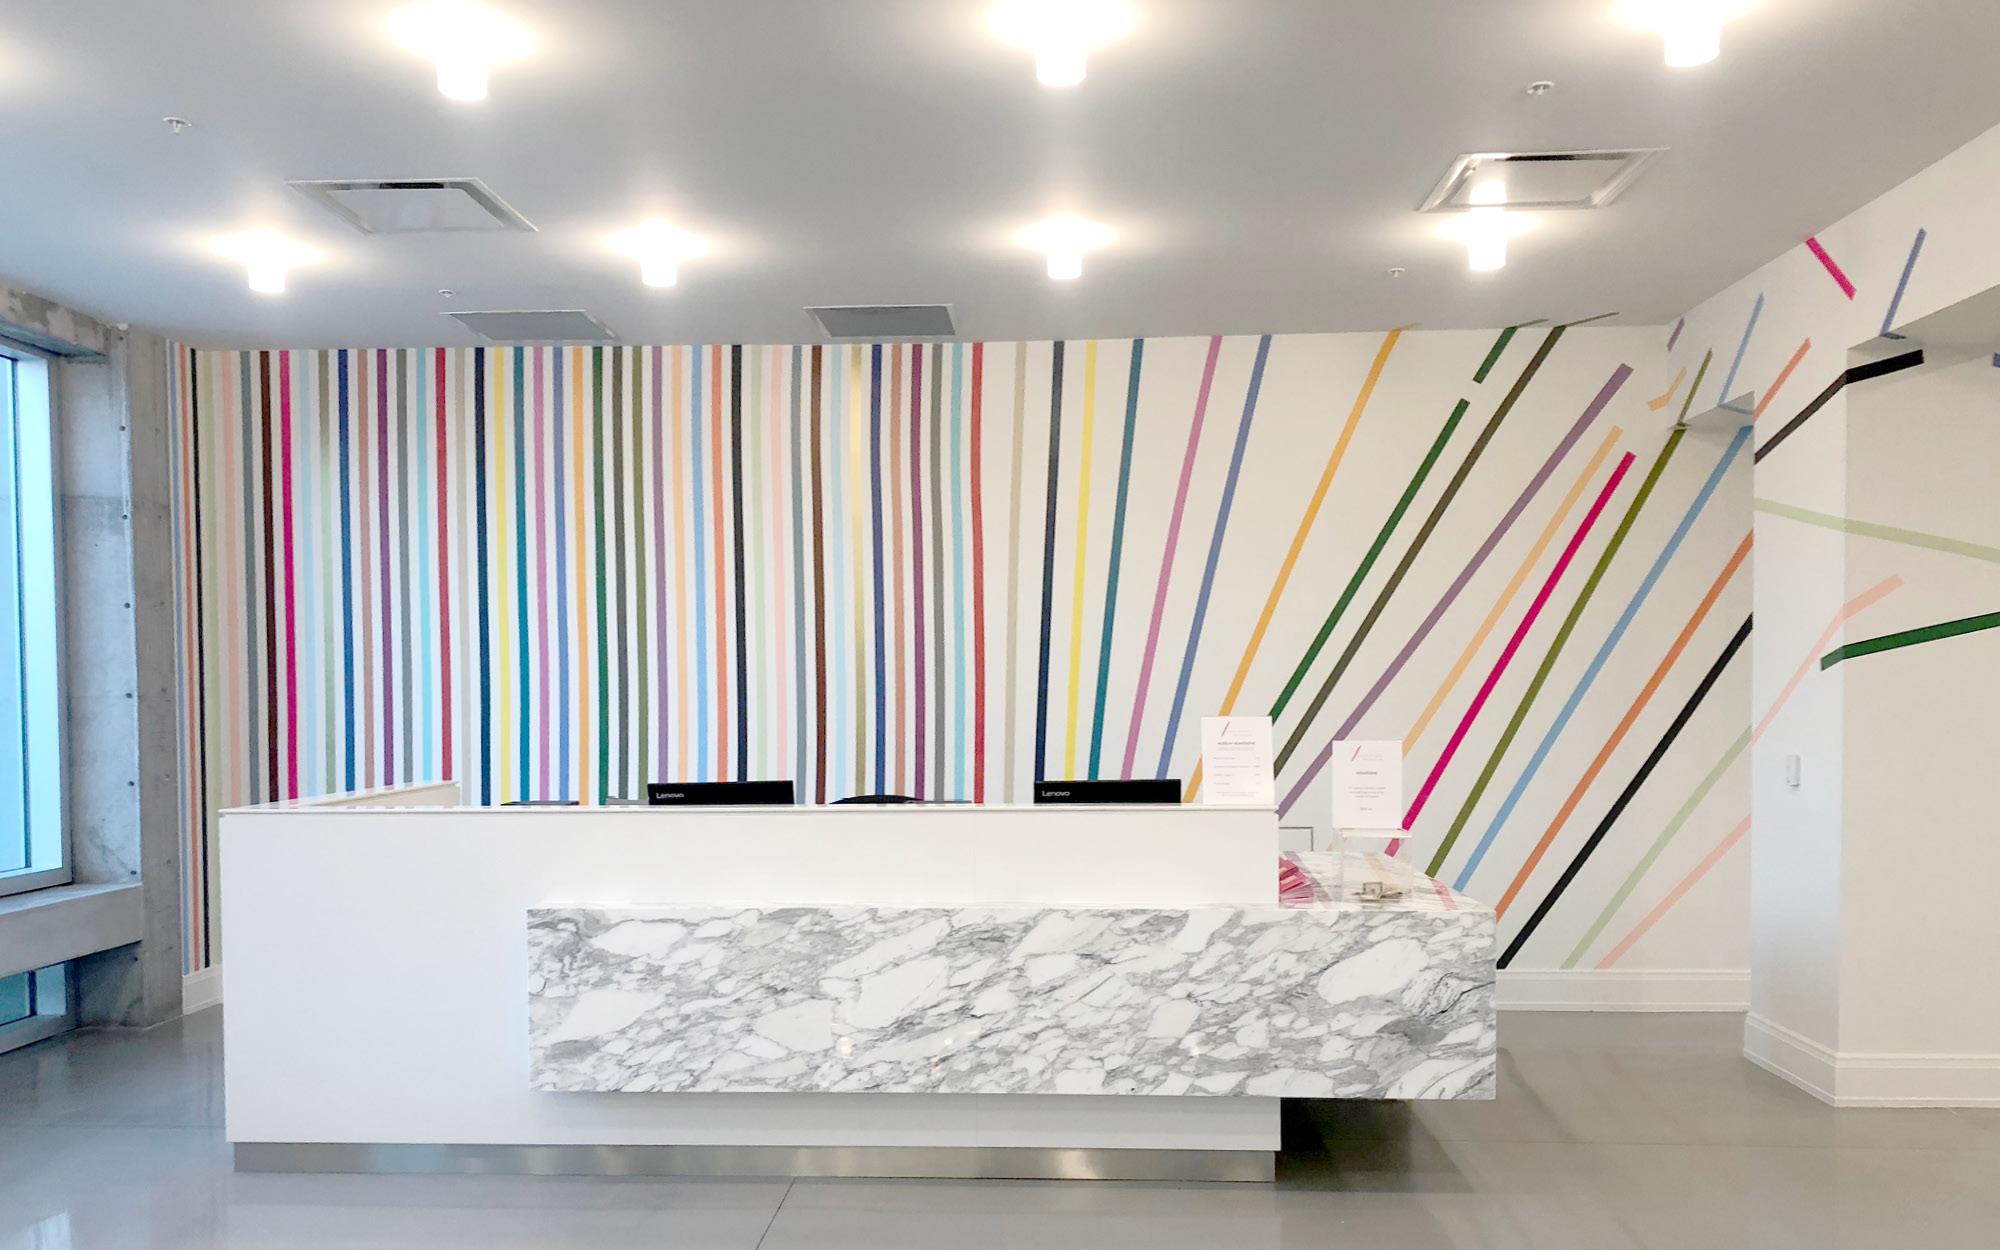 Leah Rosenberg's 28 Colors (Sarasota, FL) in the Morganthal Reception and Wendy G. Surkis & Peppi Elona Lobby at Sarasota Art Museum